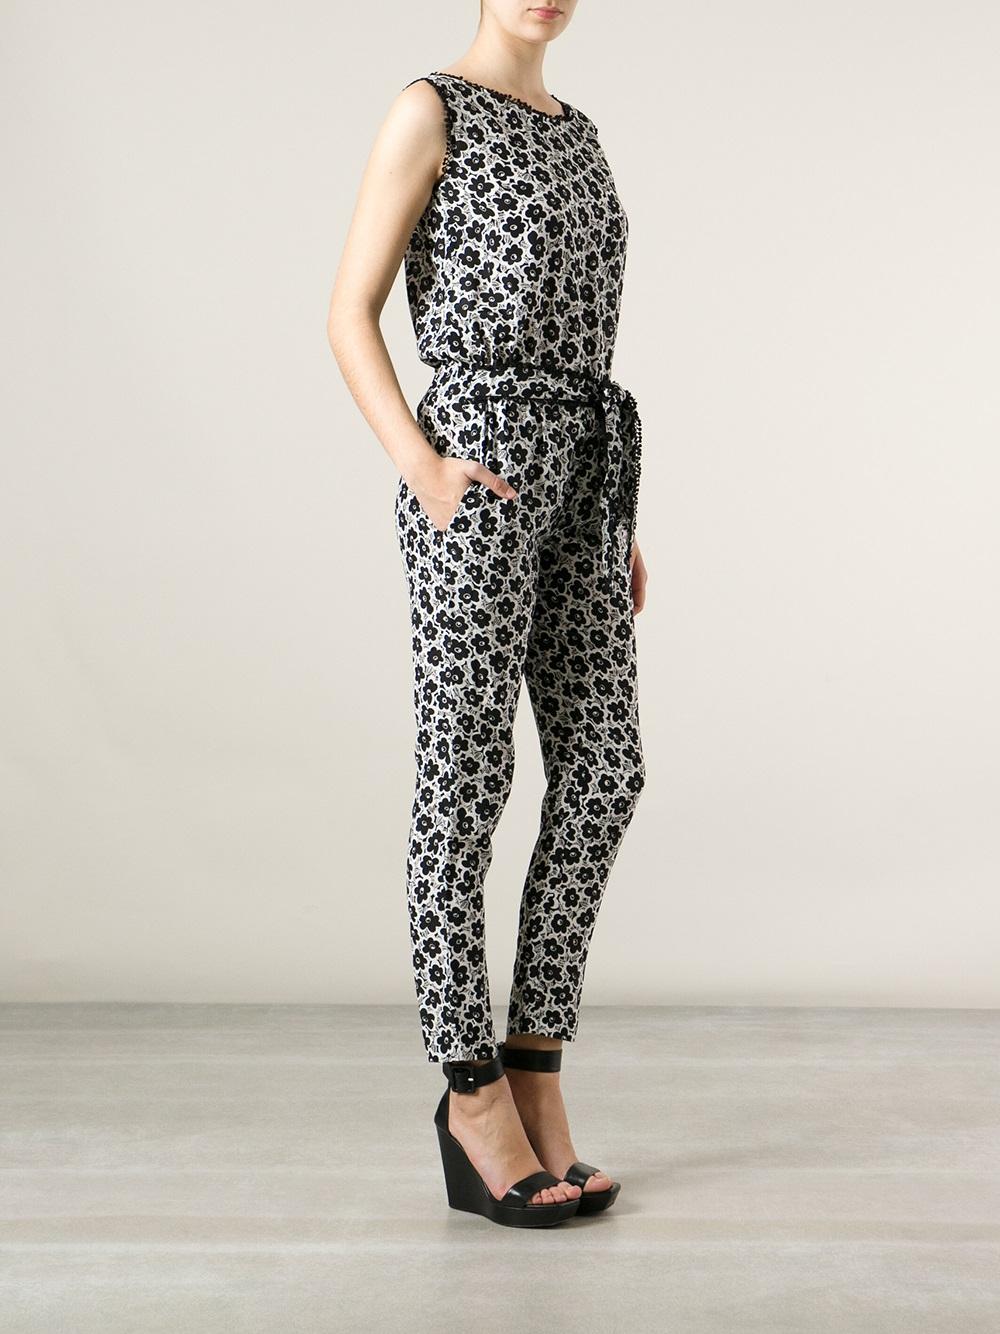 fe5cb9c96edc Lyst - Love Moschino Flower Print Jumpsuit in Gray